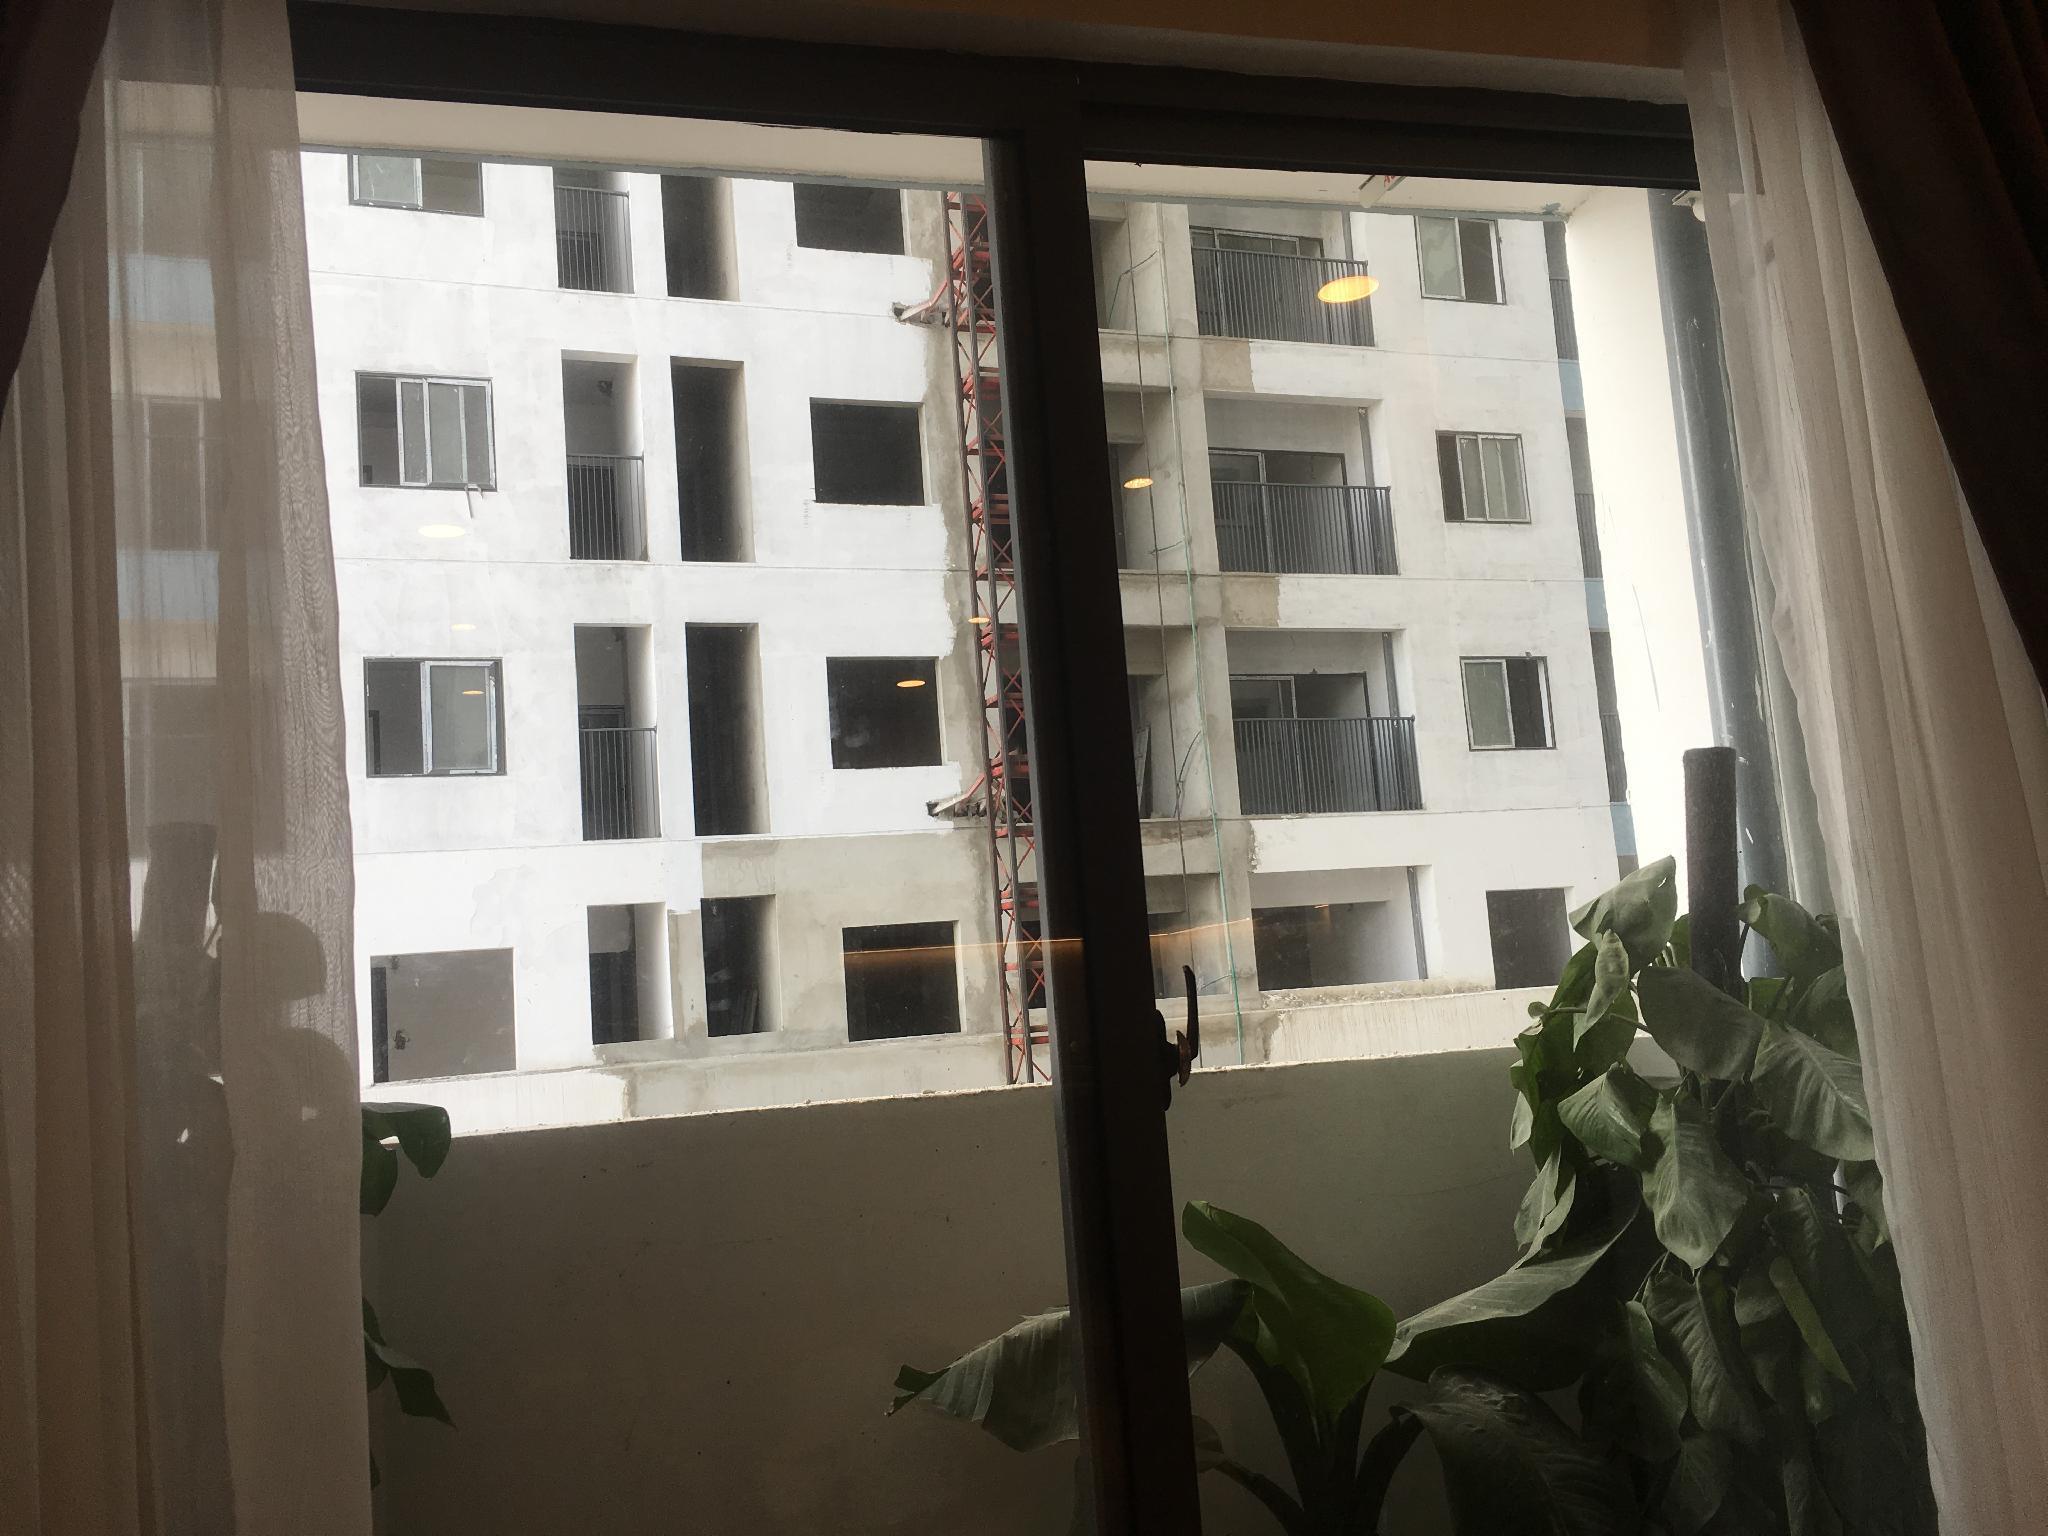 Viet Nha Trang Apartment A25 03